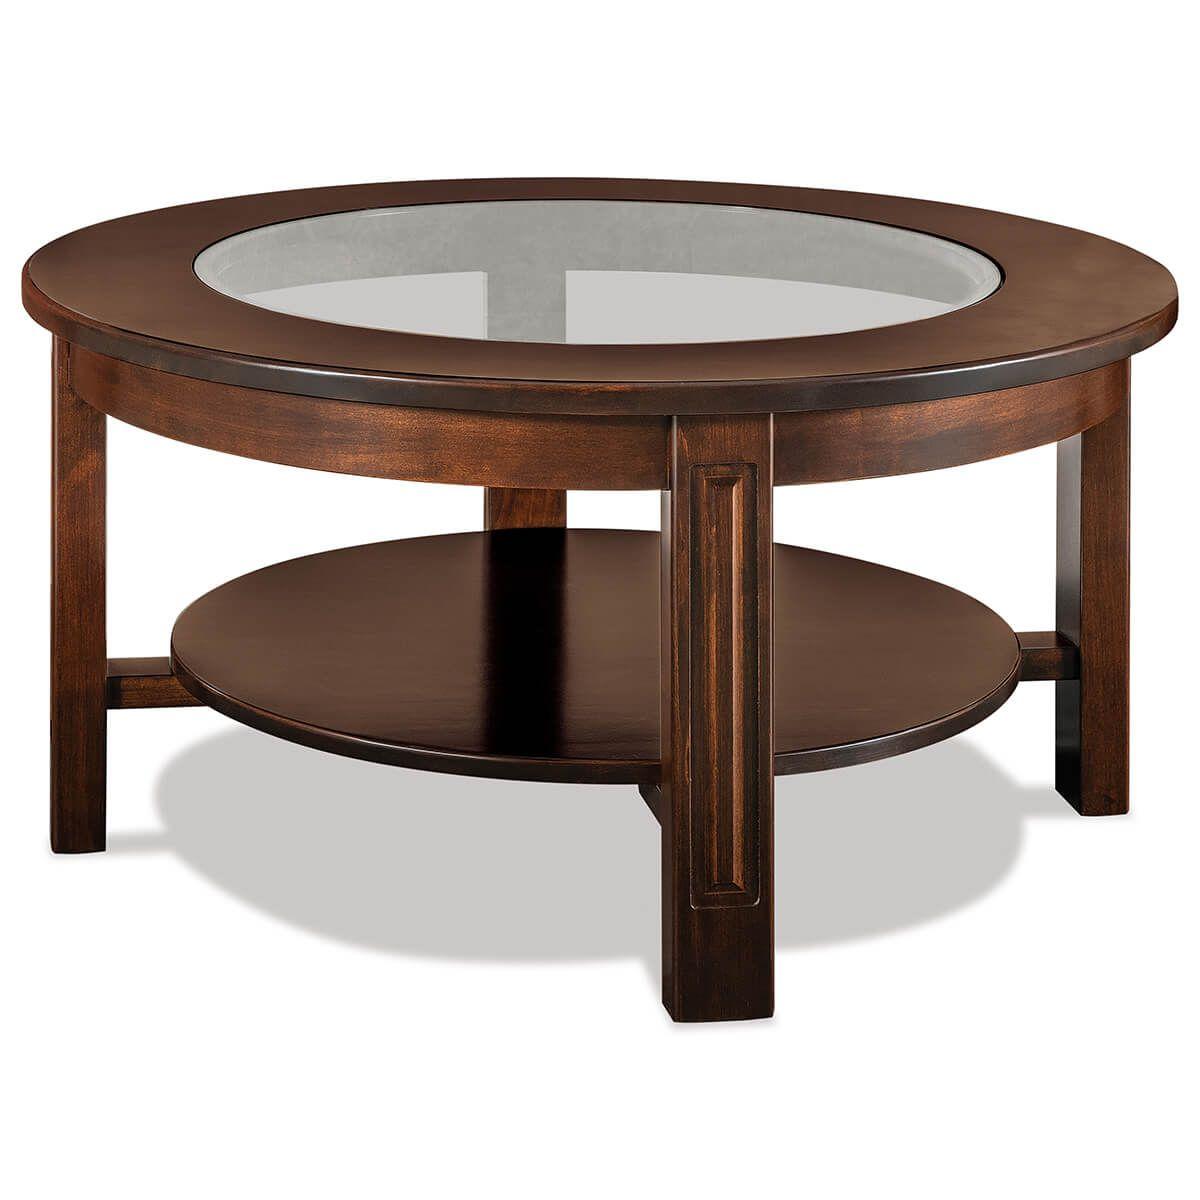 Lexington Glass Top Coffee Table Coffee Table Made Coffee Table Glass Top Coffee Table [ 1200 x 1200 Pixel ]